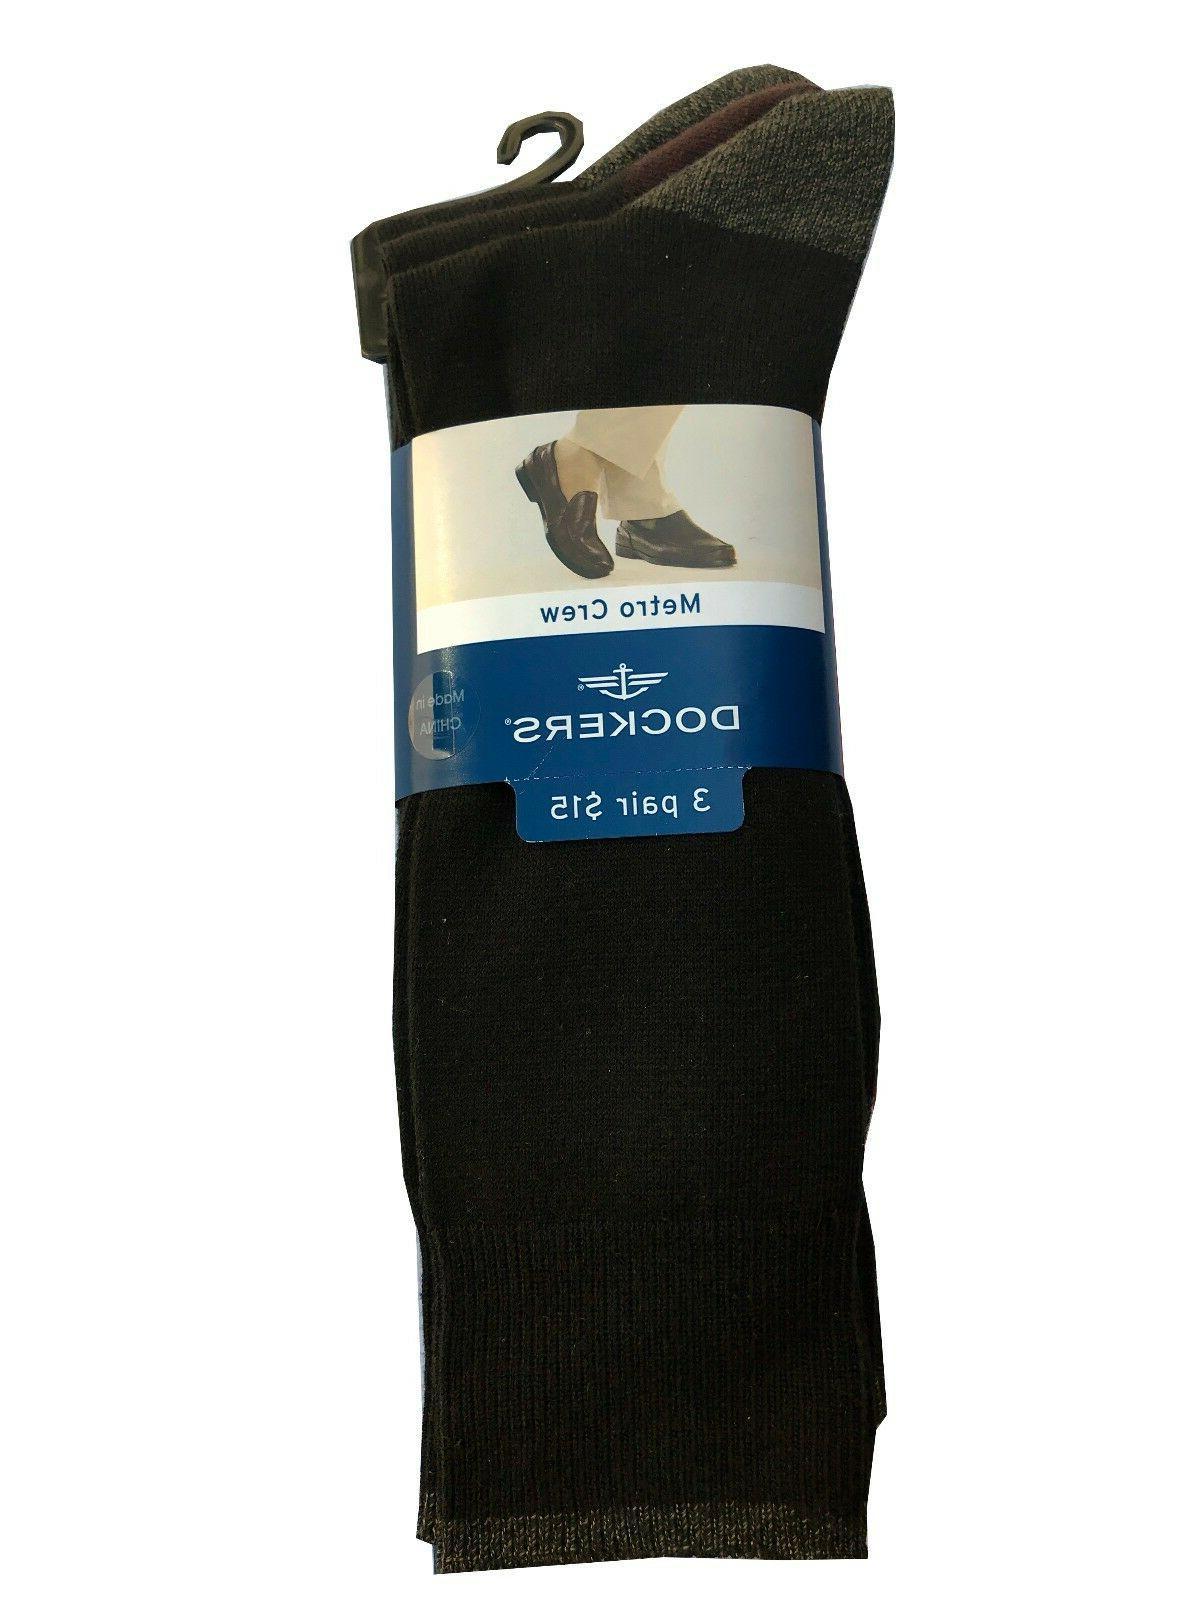 6a3013d82b0 Dockers® Men s Crew Socks 3-Pack Fit size 8-12